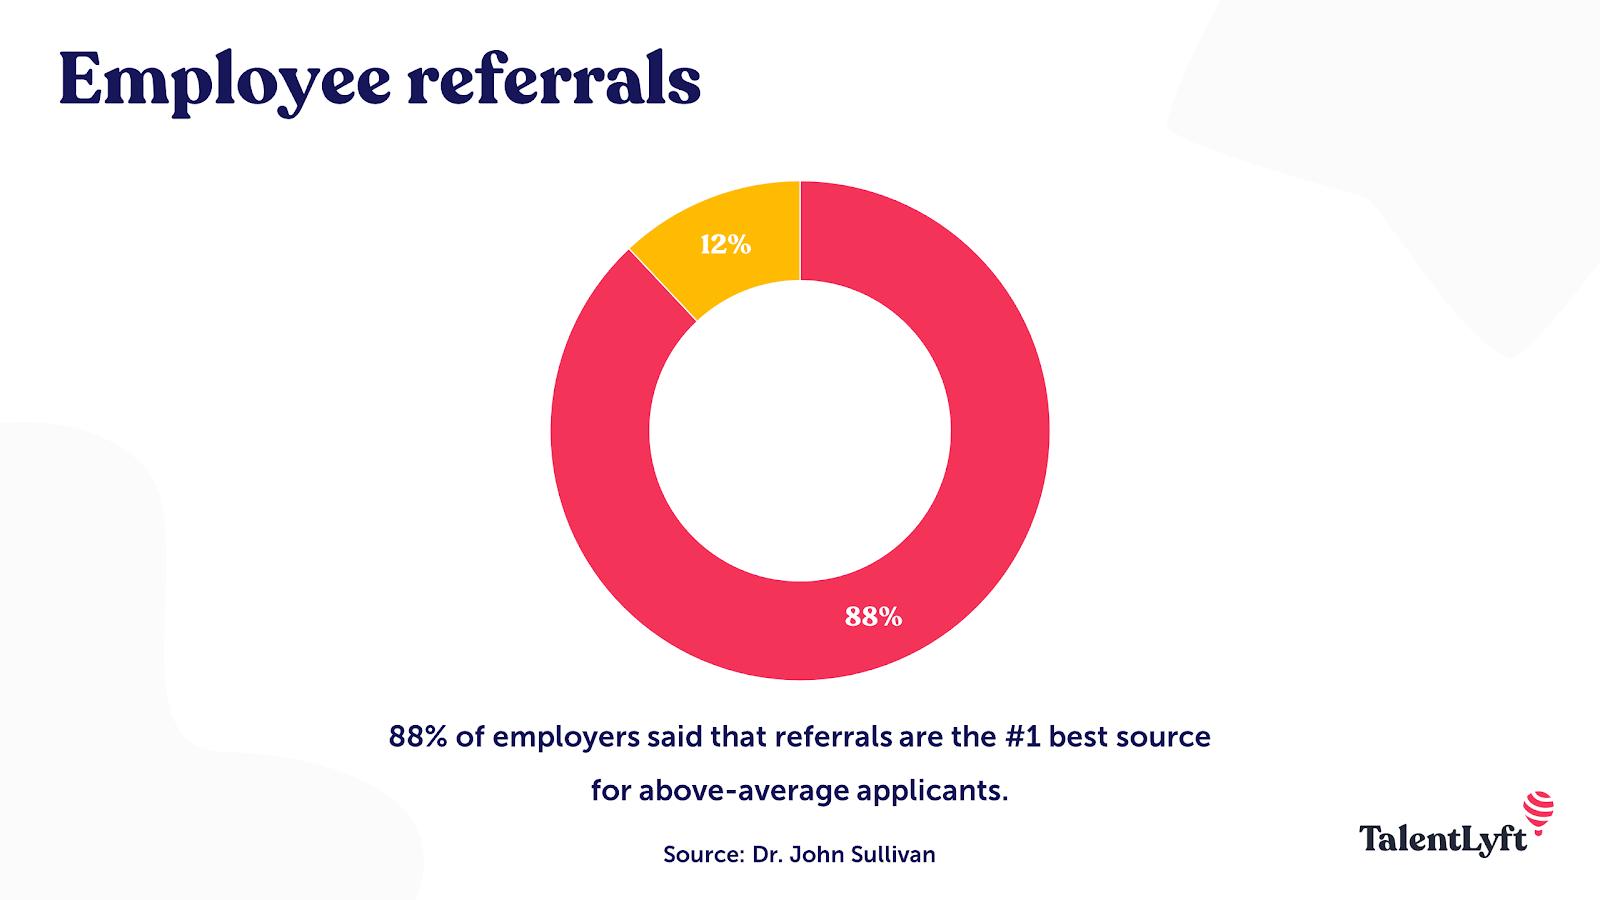 Employee referrals statistic